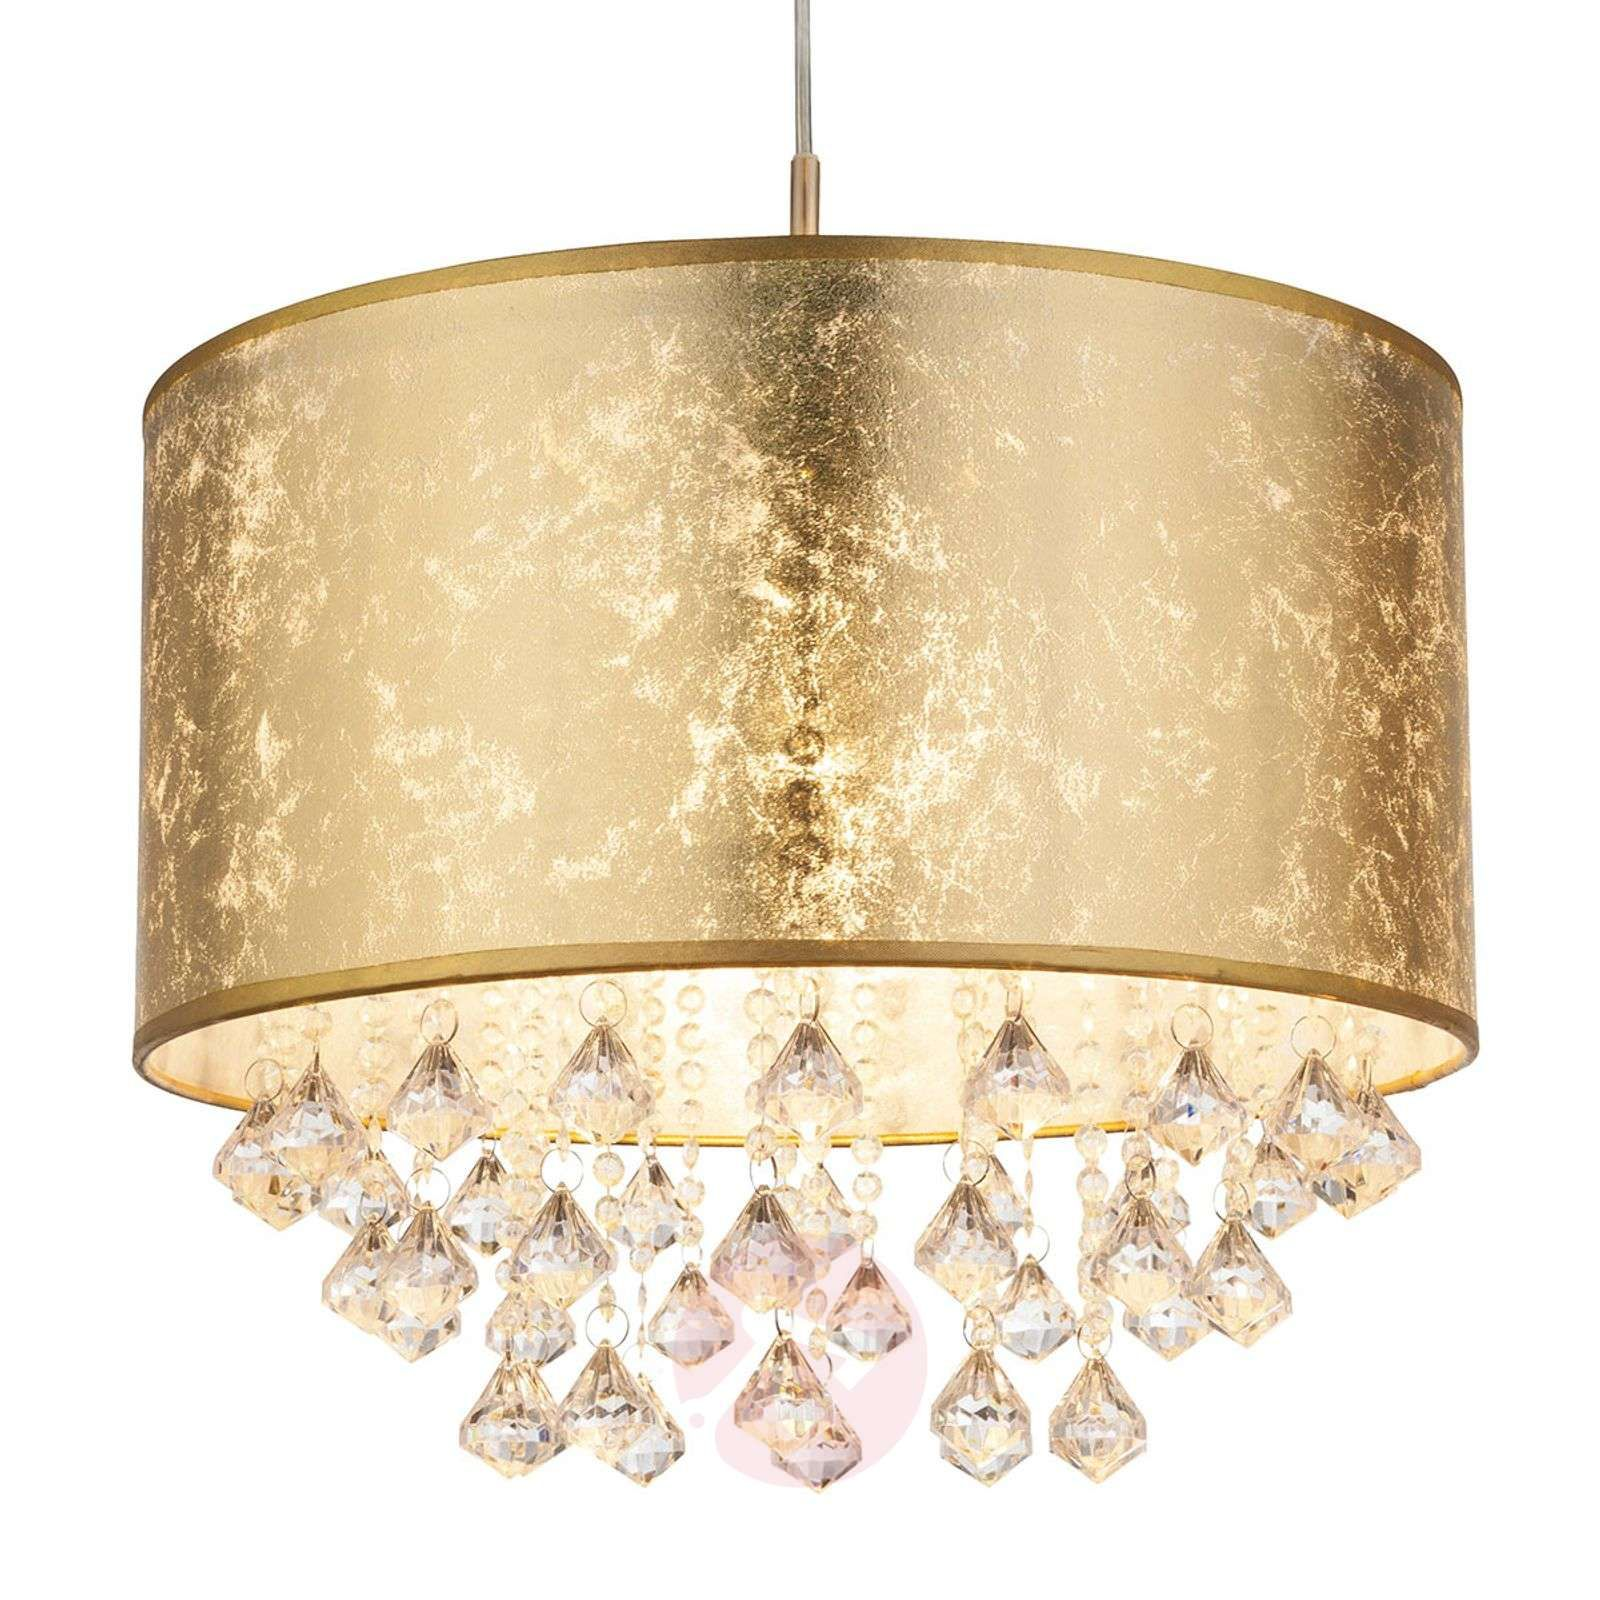 listwa ledowa | metalowa lampa | lampa stojąca srebrna